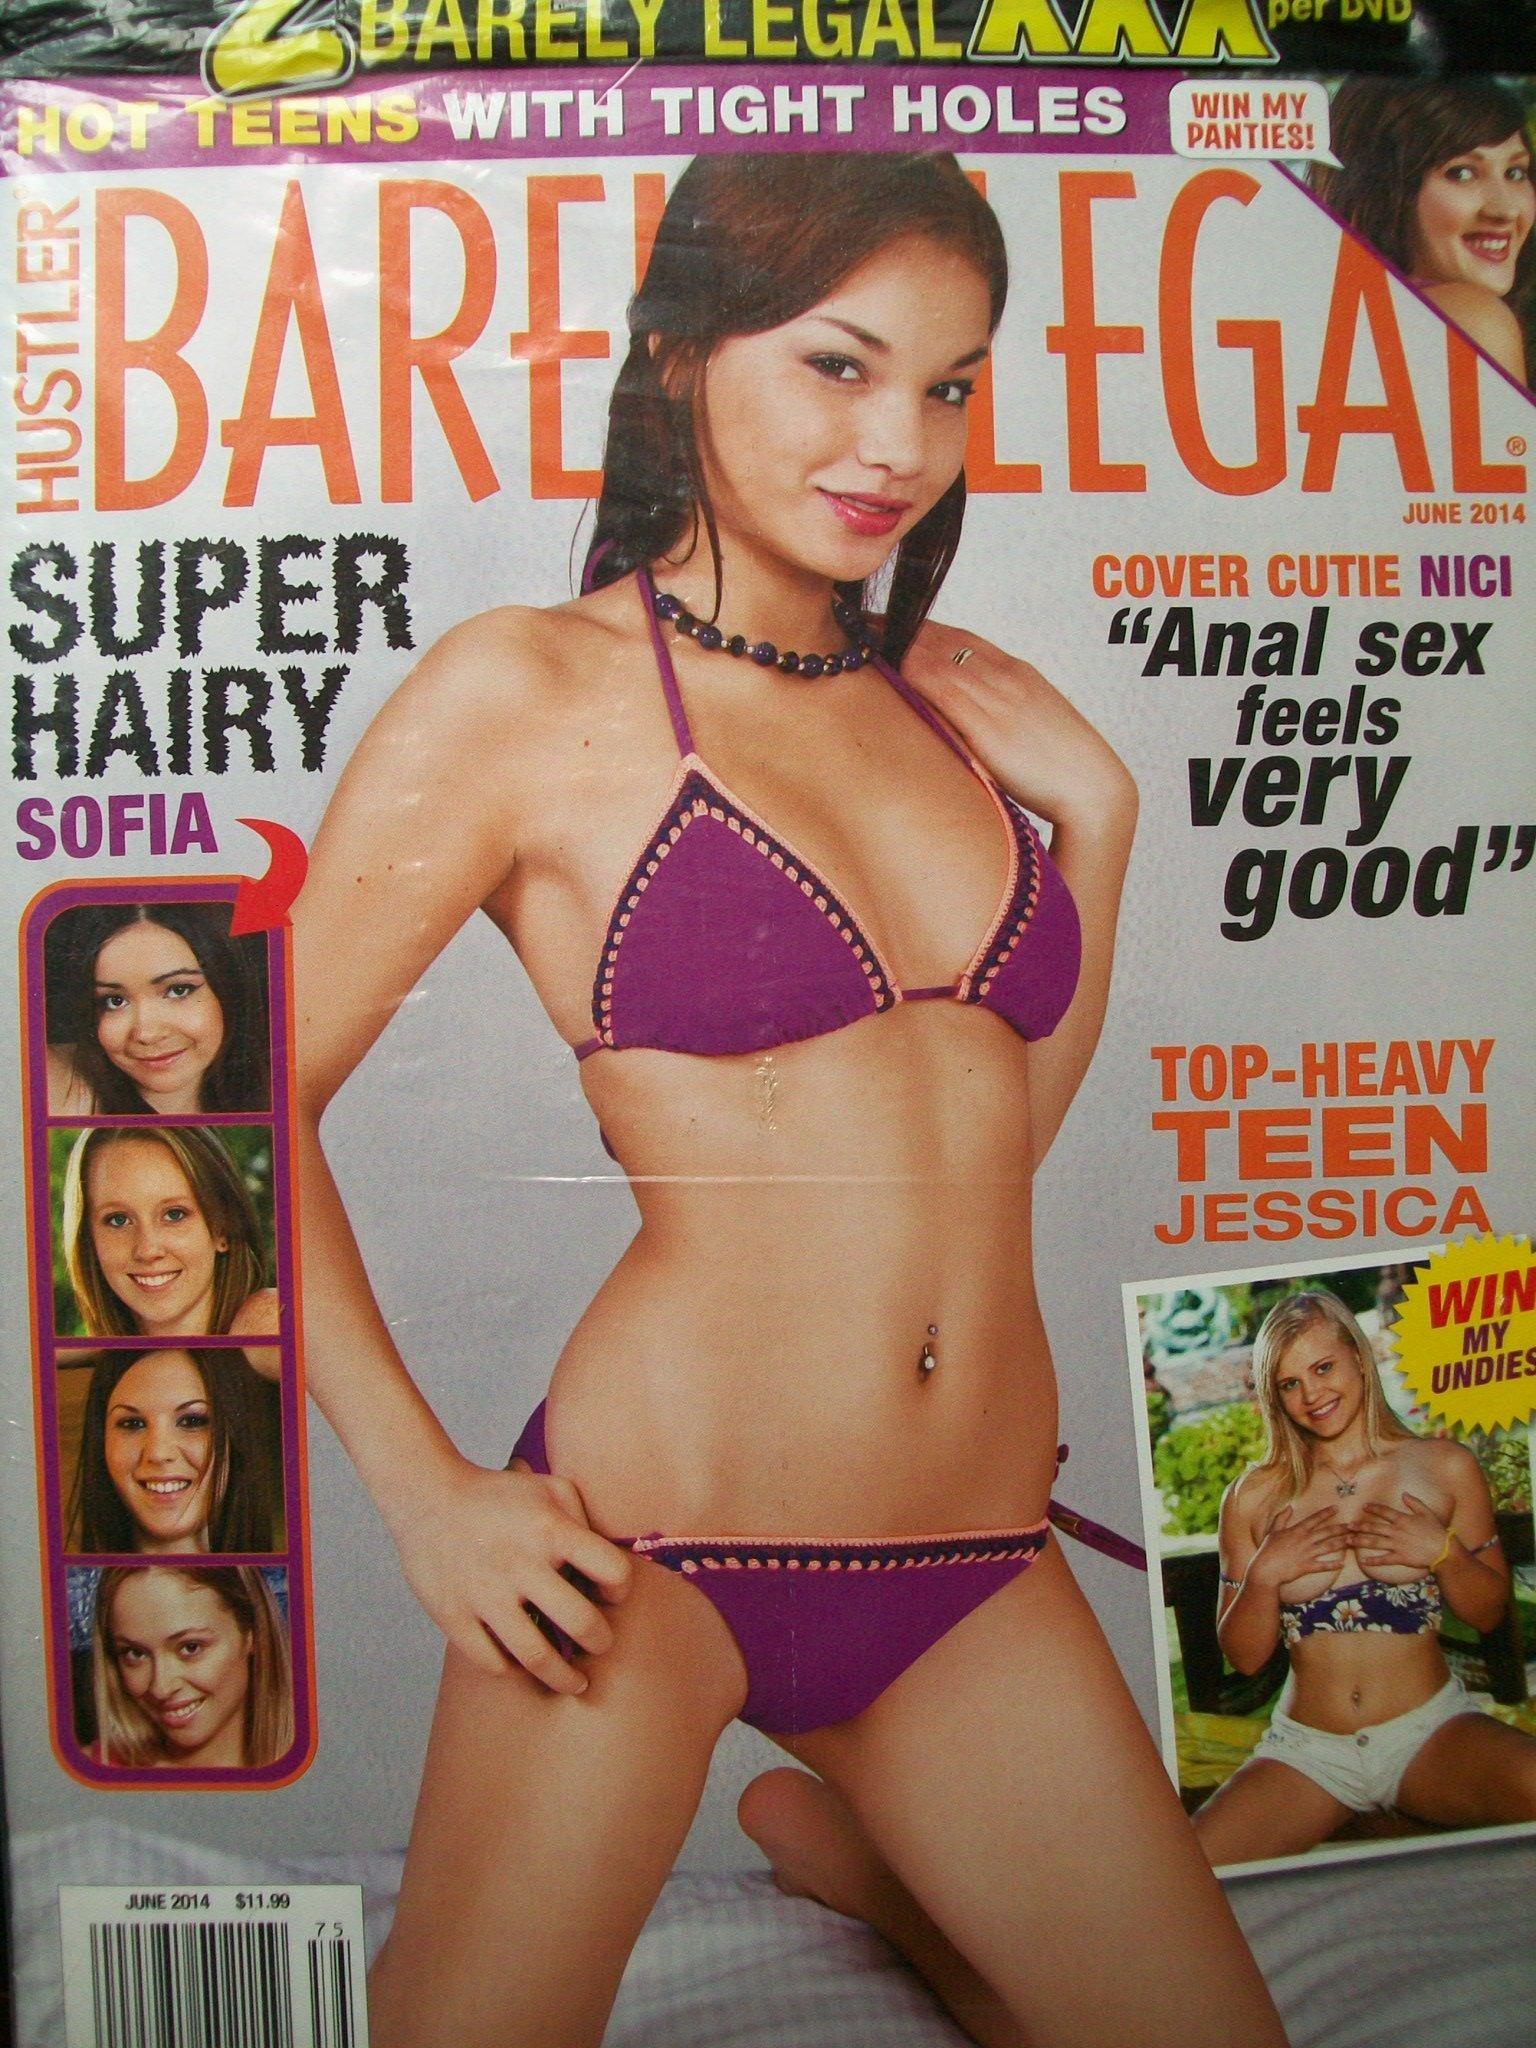 BARELY LEGAL Adult Magazine June 2014 by Hustler